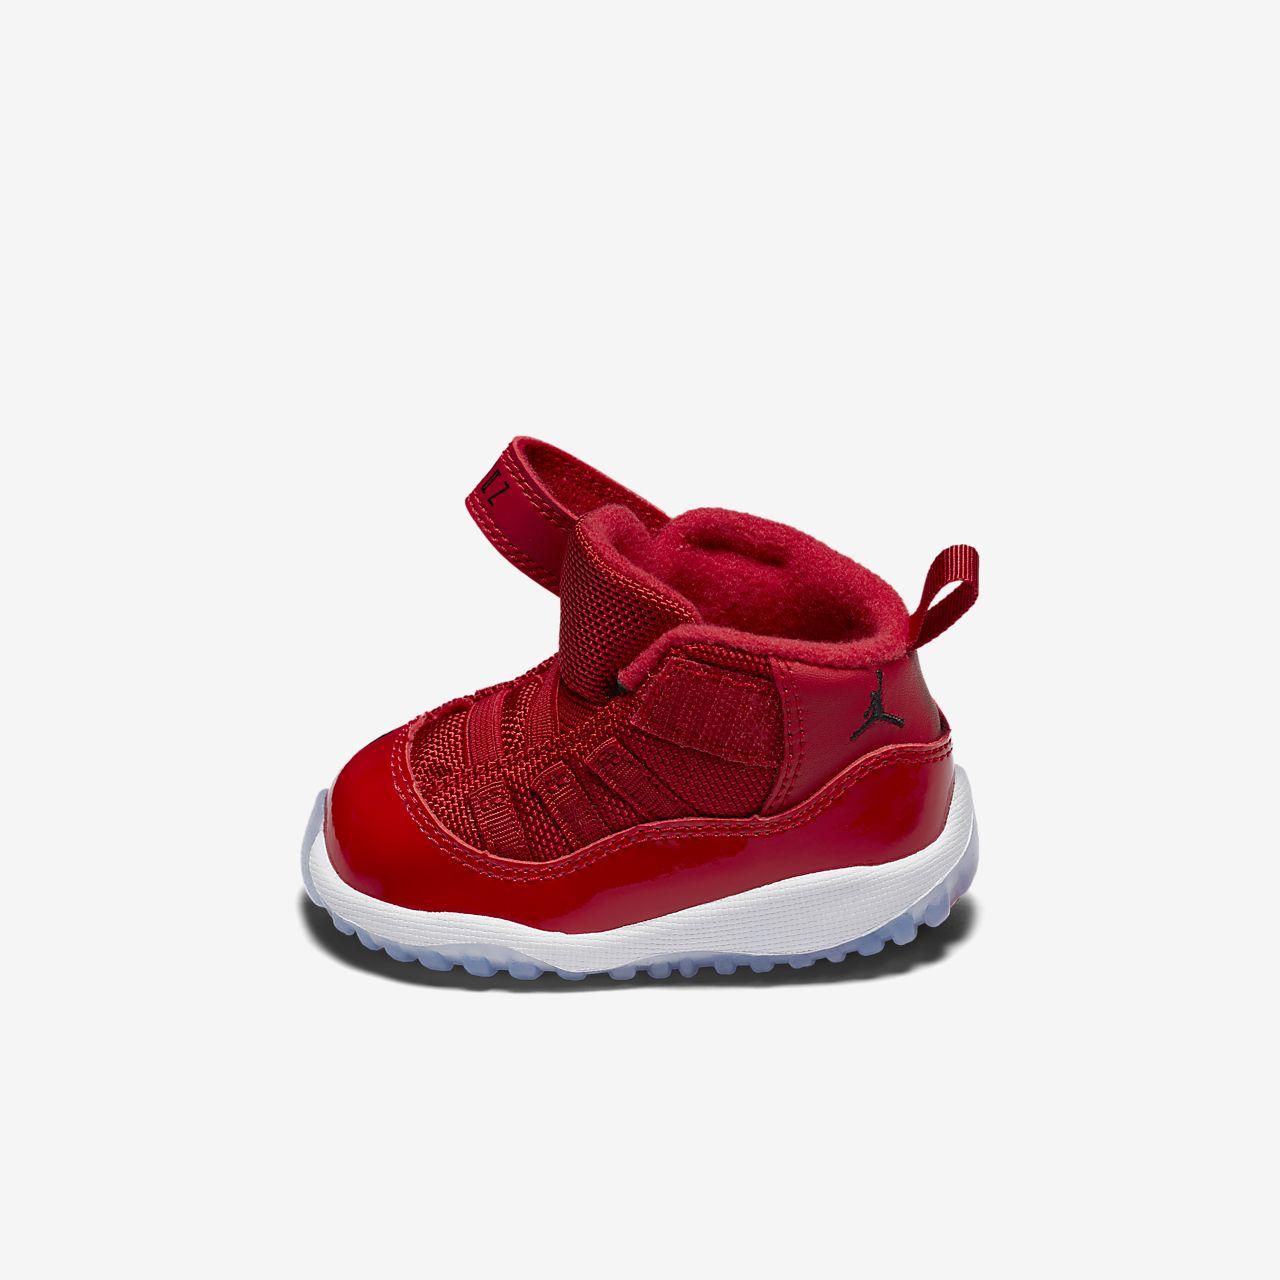 ... Air Jordan XI Retro Three-Quarter Toddler Shoe